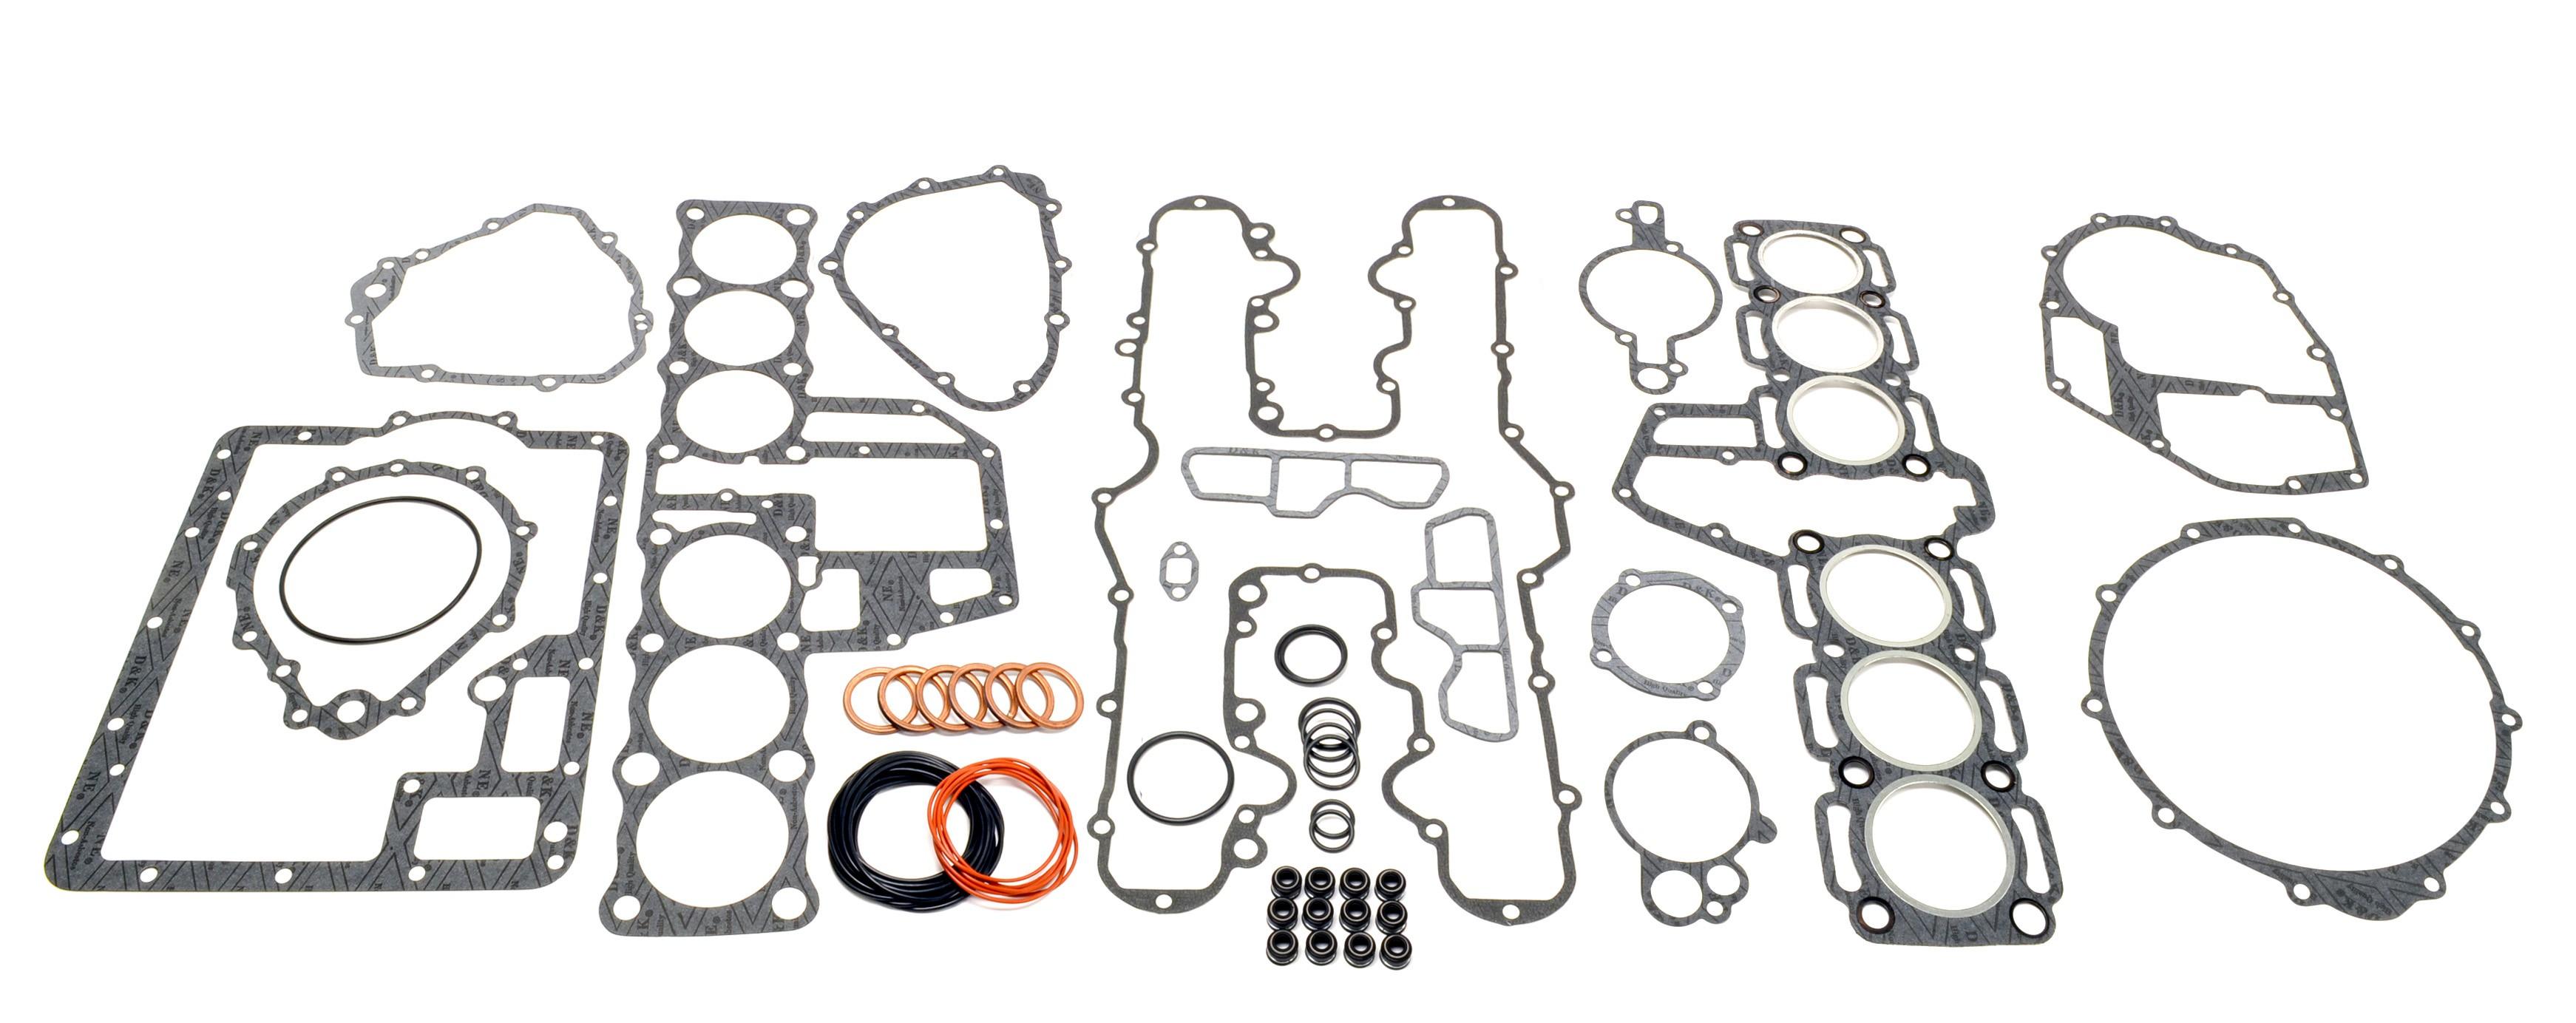 Z Fuse Box Diagram Wiring Diagrams Nissan Pickup Torzone